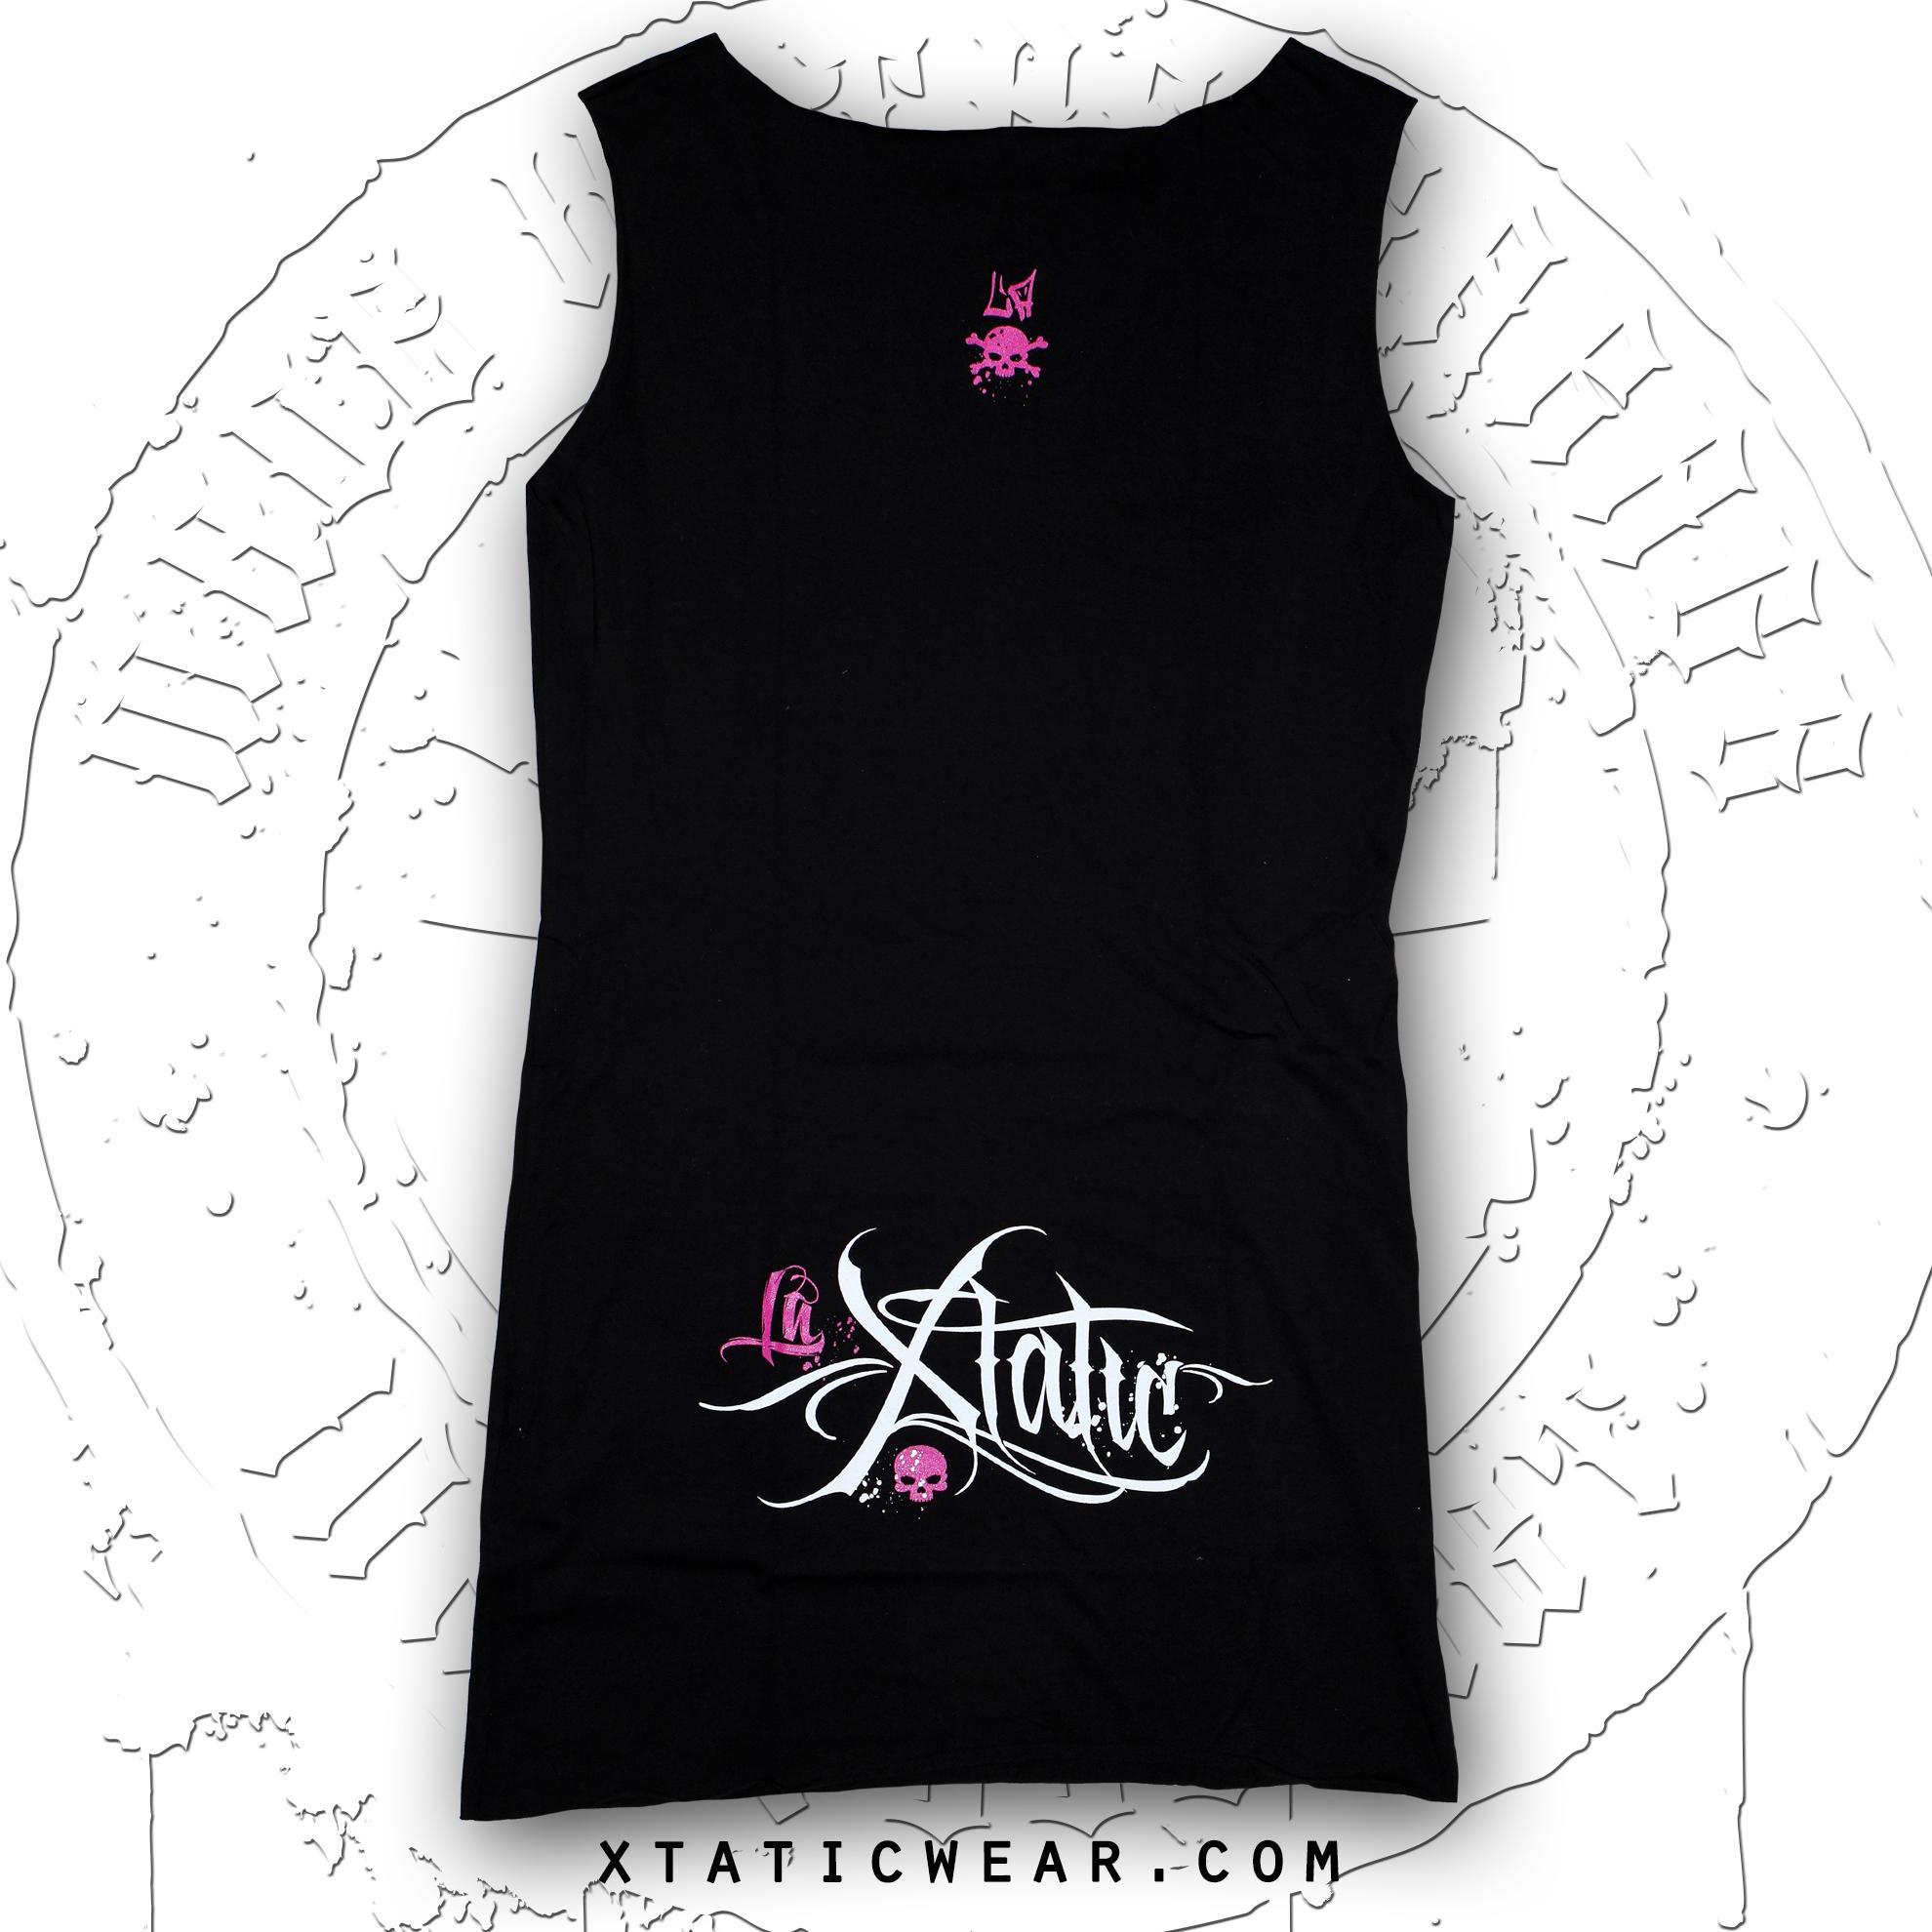 la_xtatic_long_top_sugar_skull_black_shirts_4.jpg